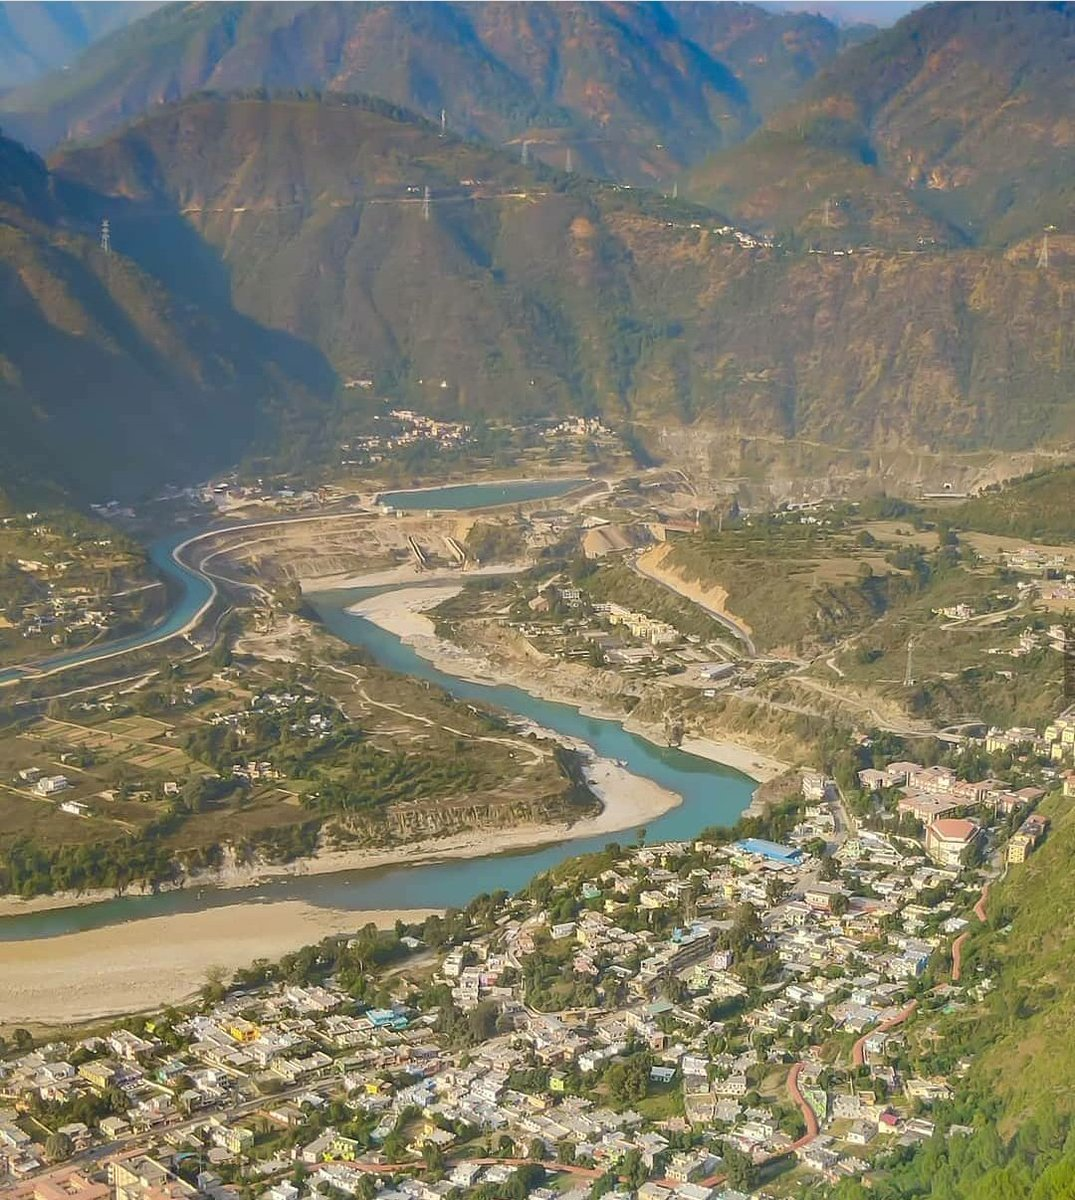 Hometown Srinagar Garhwal Uttarakhand.#Memory #routekedarnath #badrinath https://t.co/rYQDHNHDpx